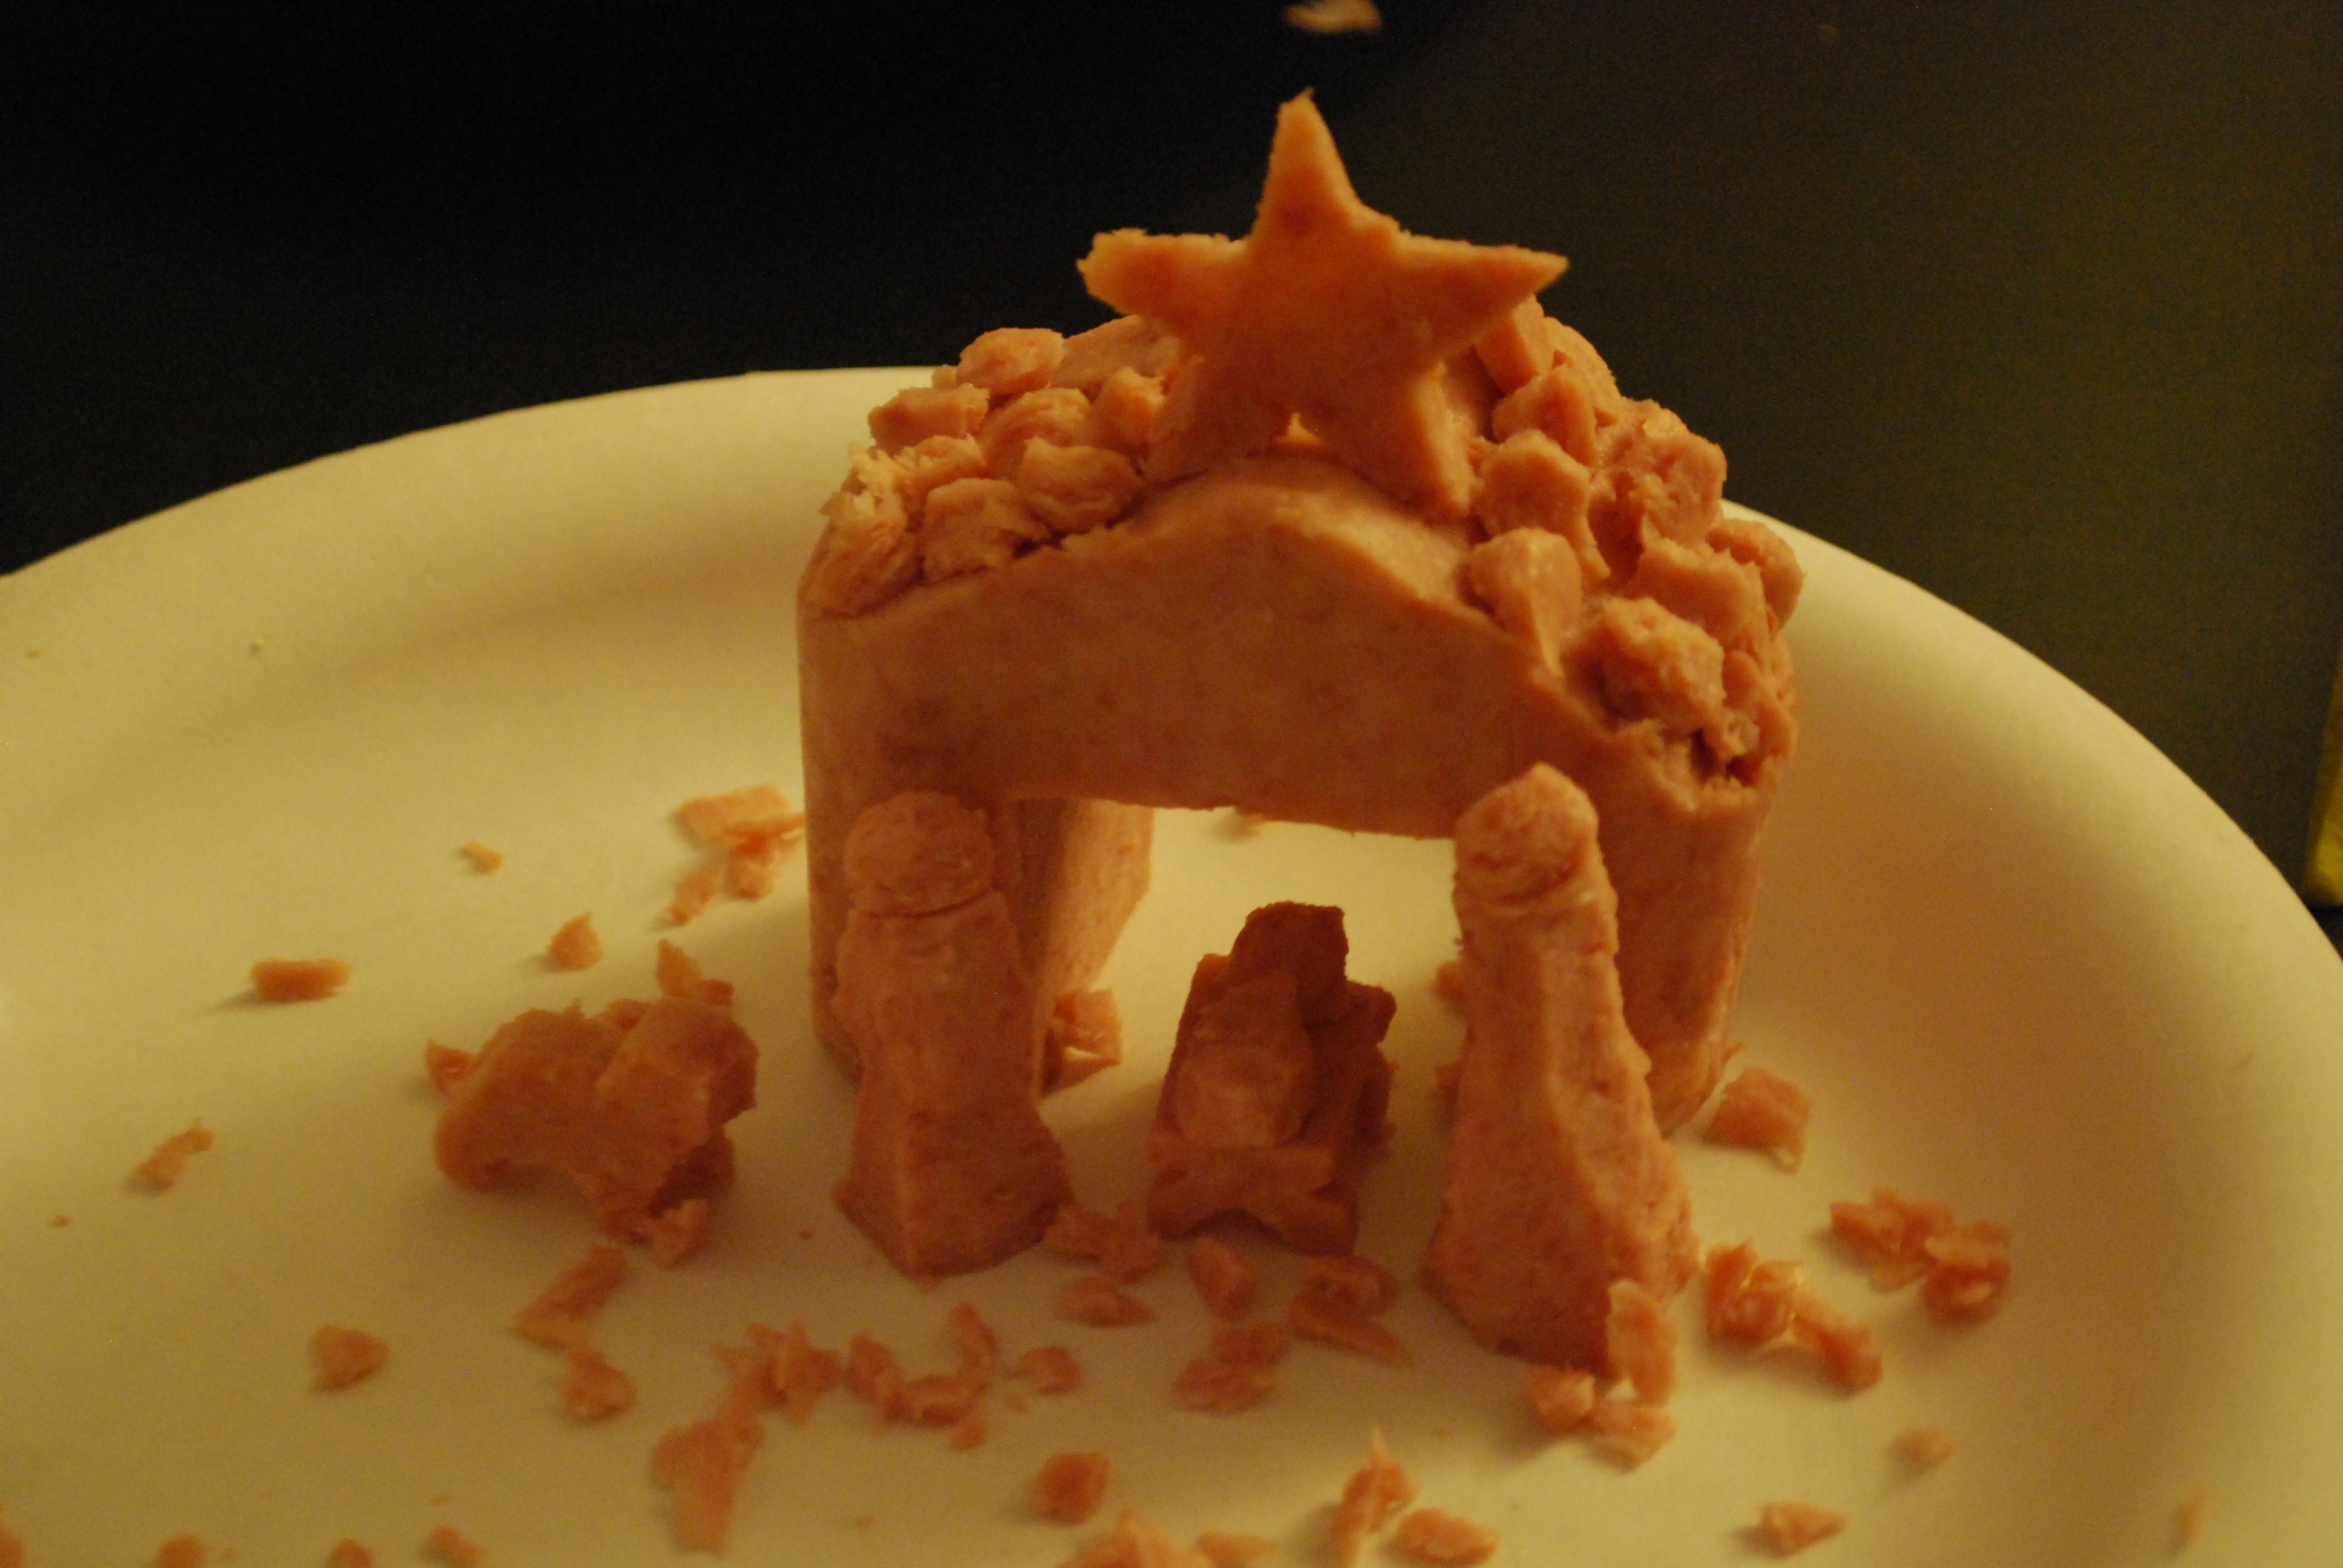 the 50 worst and weirdest nativity sets whyismarko